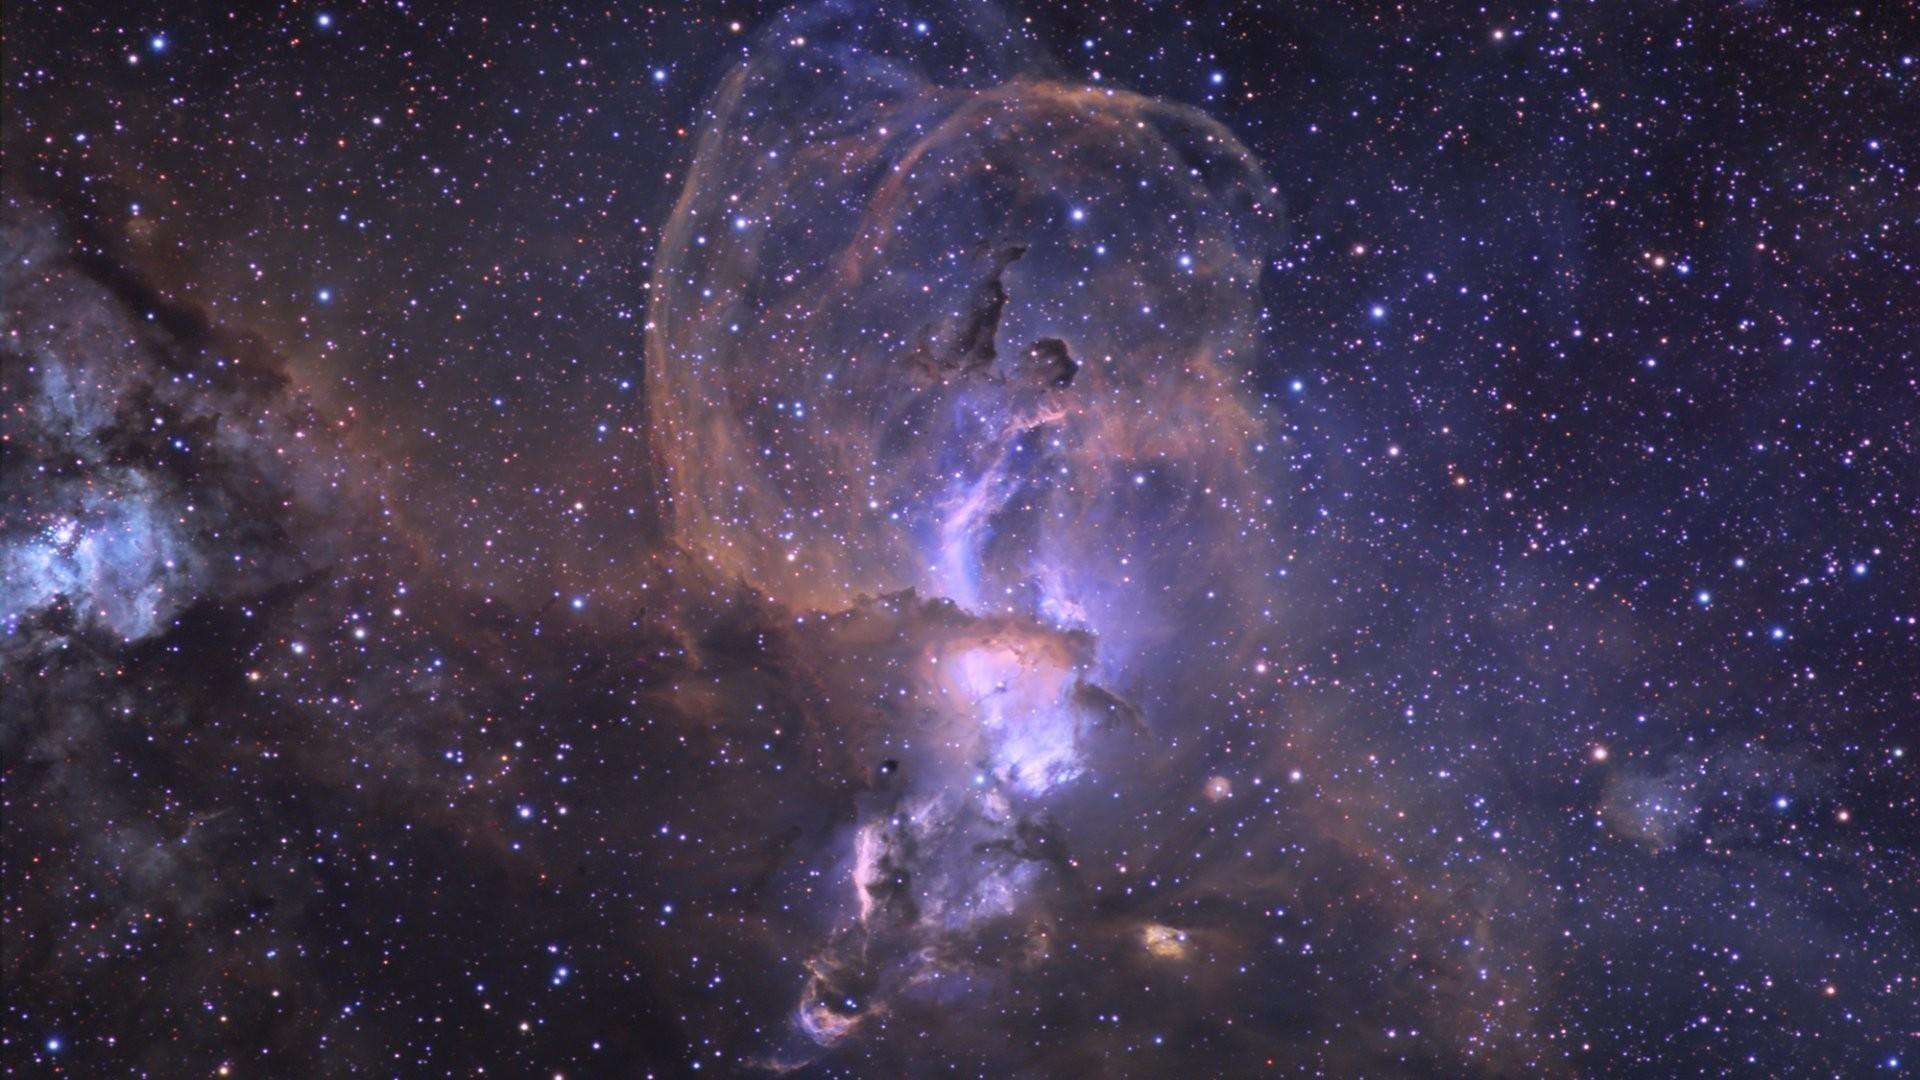 Nasa Hubble Wallpapers Top Free Nasa Hubble Backgrounds Wallpaperaccess